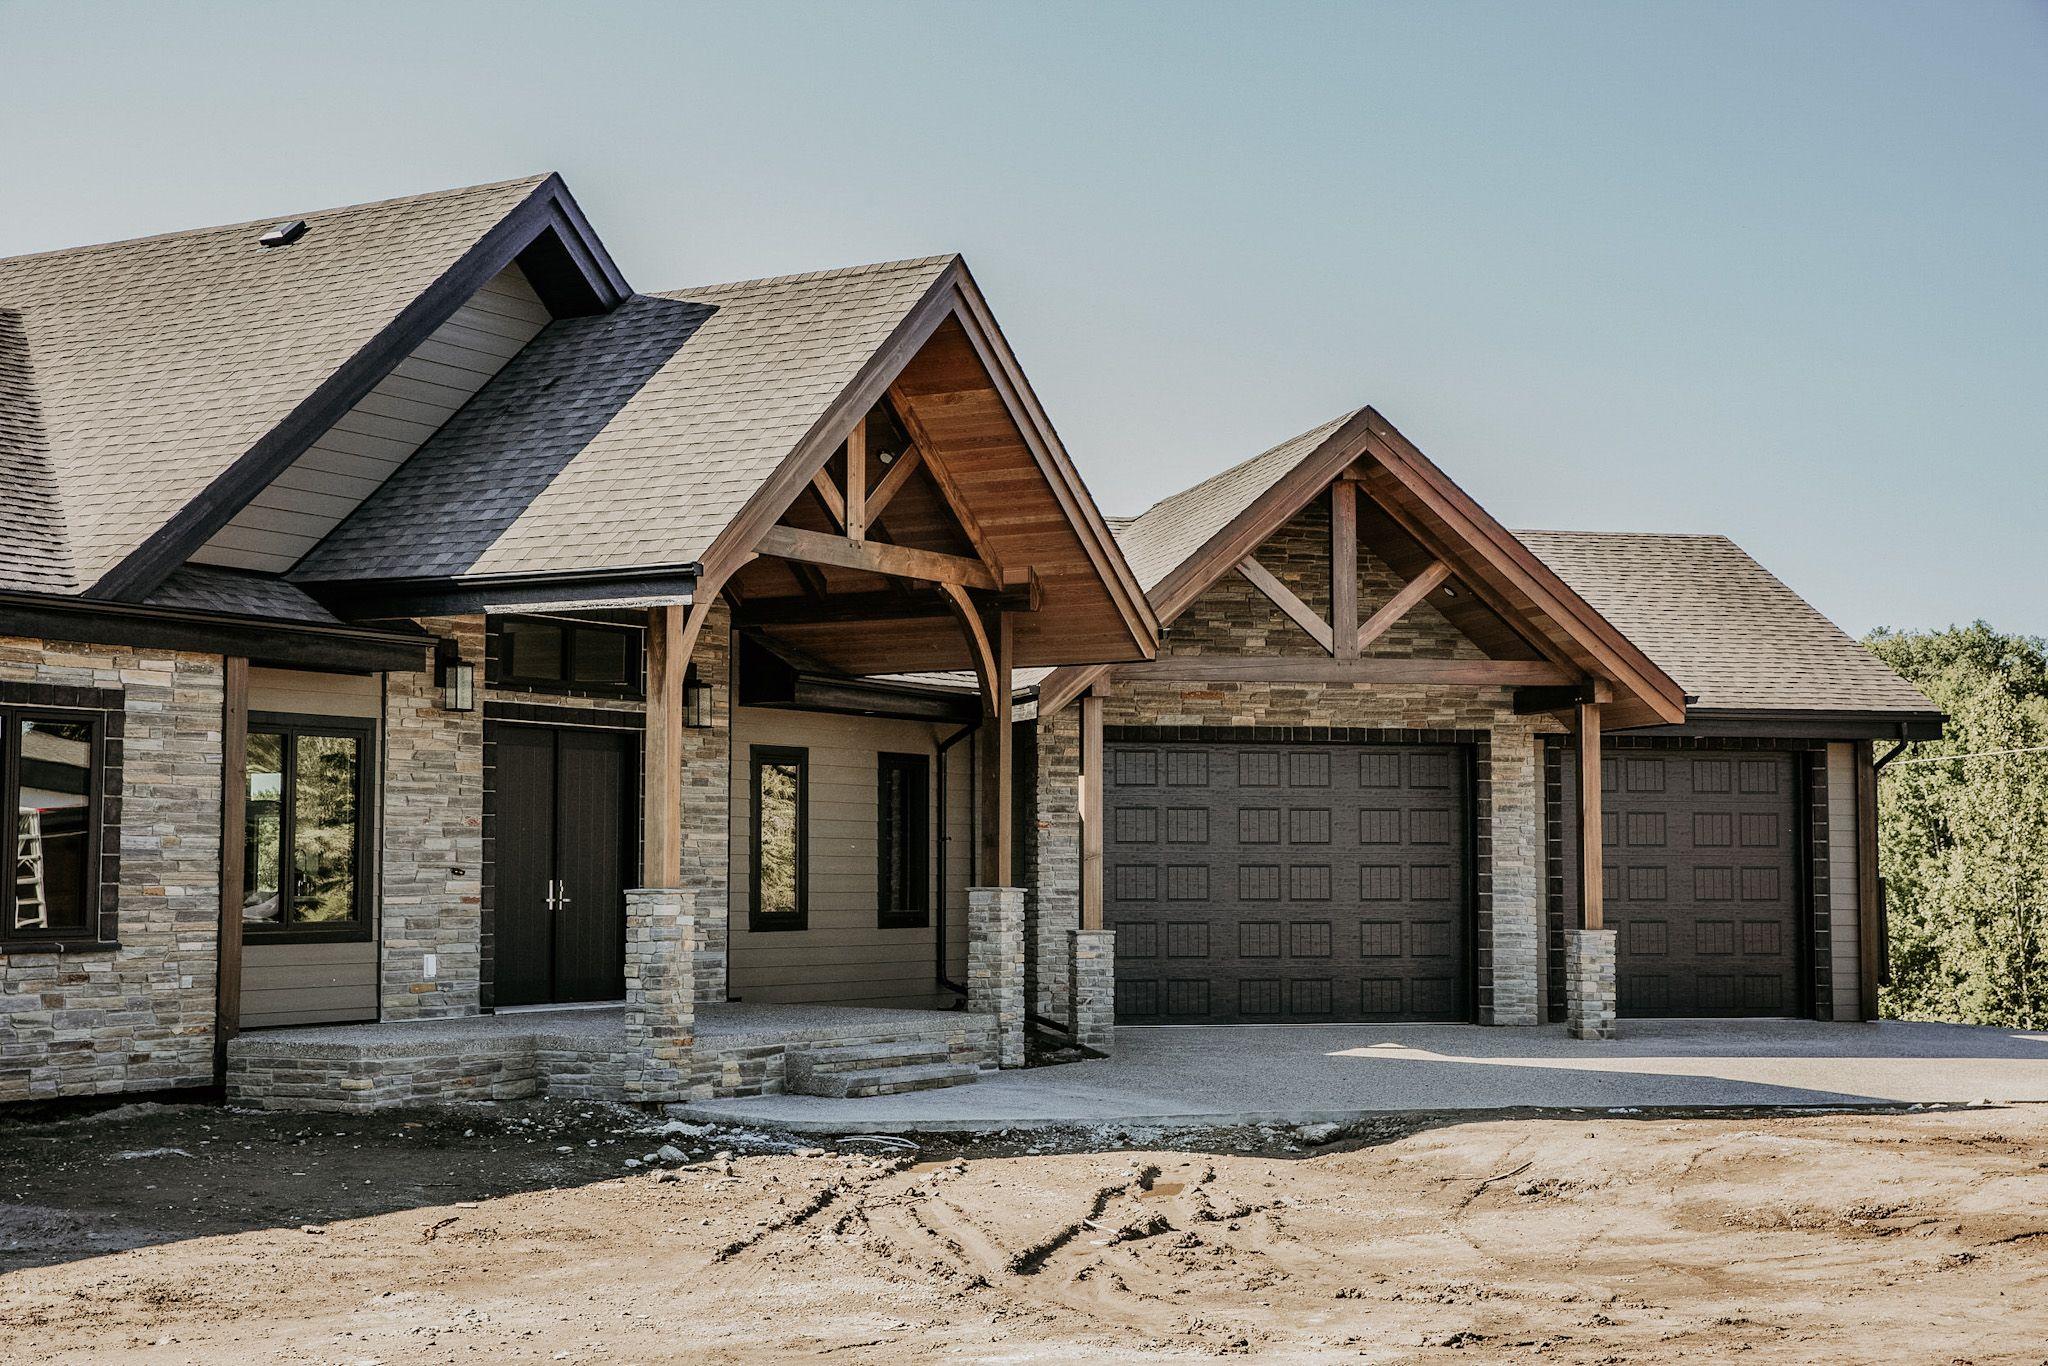 695cd6e7cd73396ca3978db892f2d130 - Better Homes And Gardens Grande Prairie Alberta